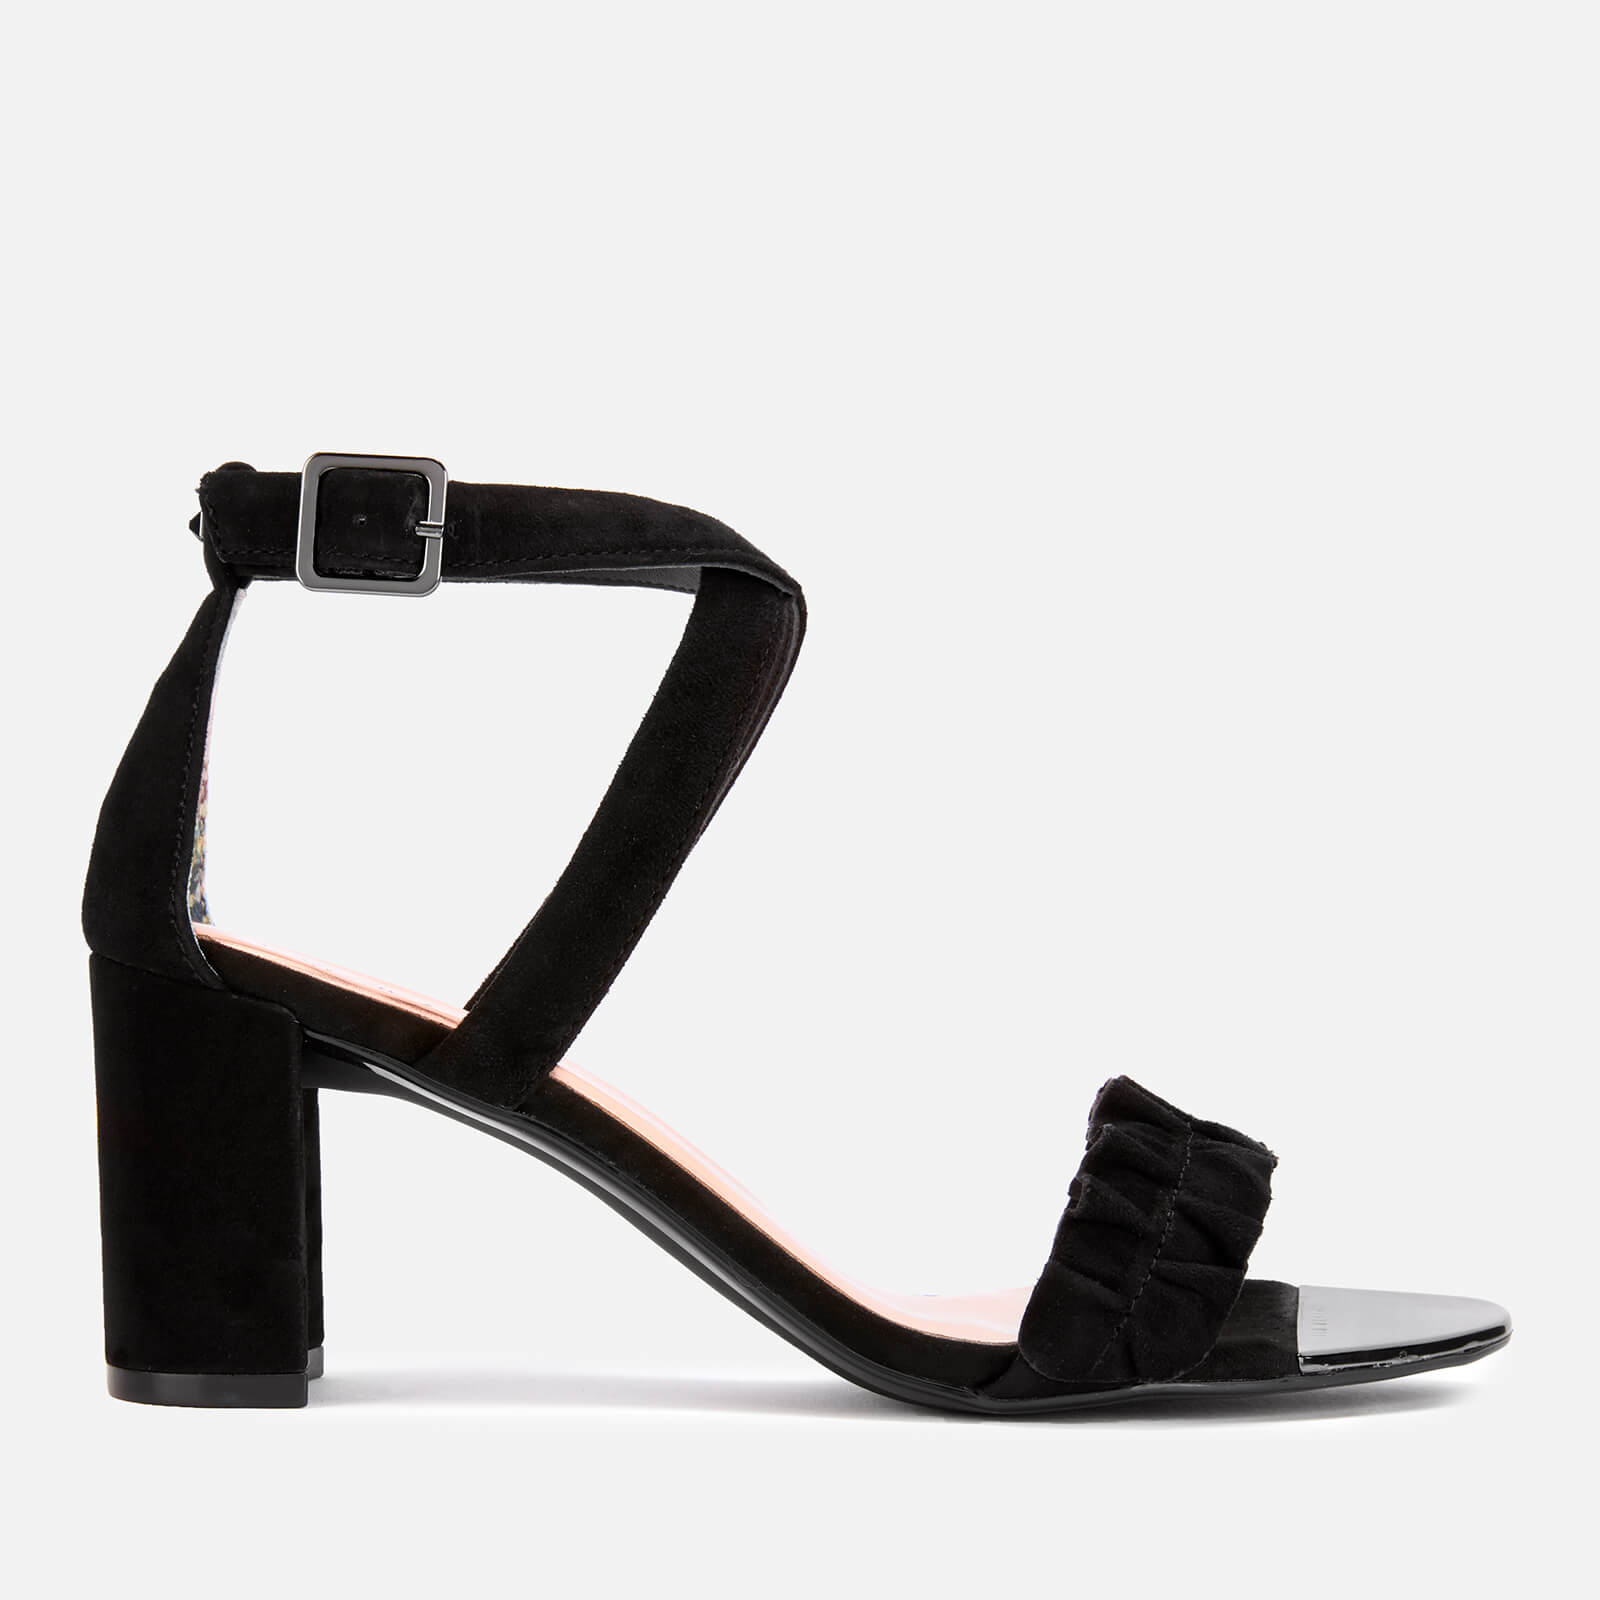 Ted Baker Women's Floxen Suede Block Heeled Sandals - Black - UK 4 - Black